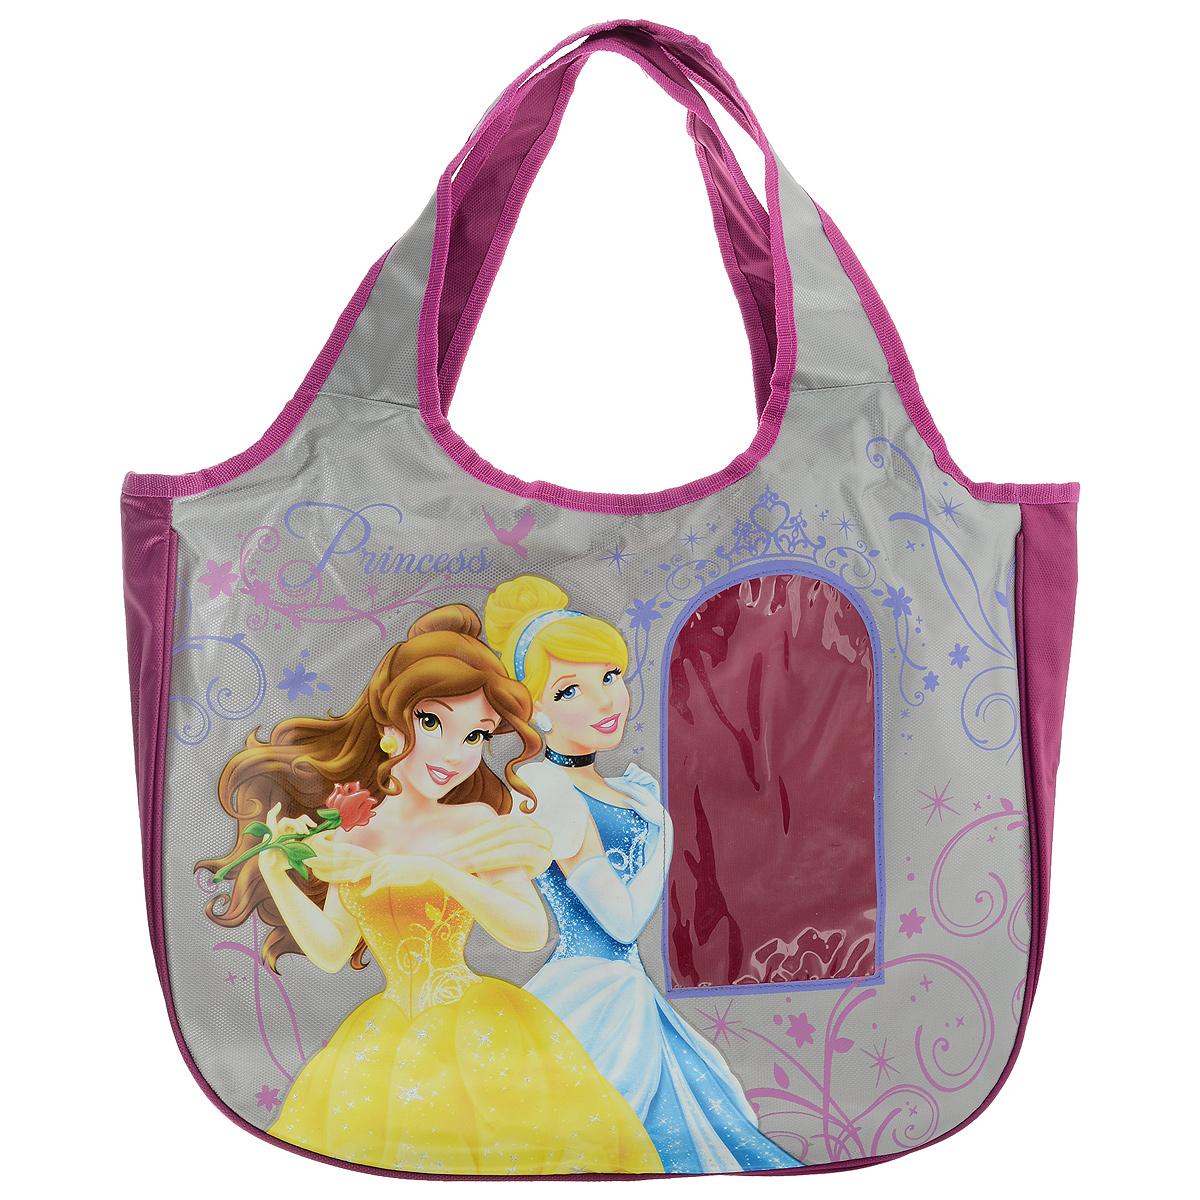 Сумка детская Disney Princess, цвет: розовый, серый. PRAS-UT-1445 цена